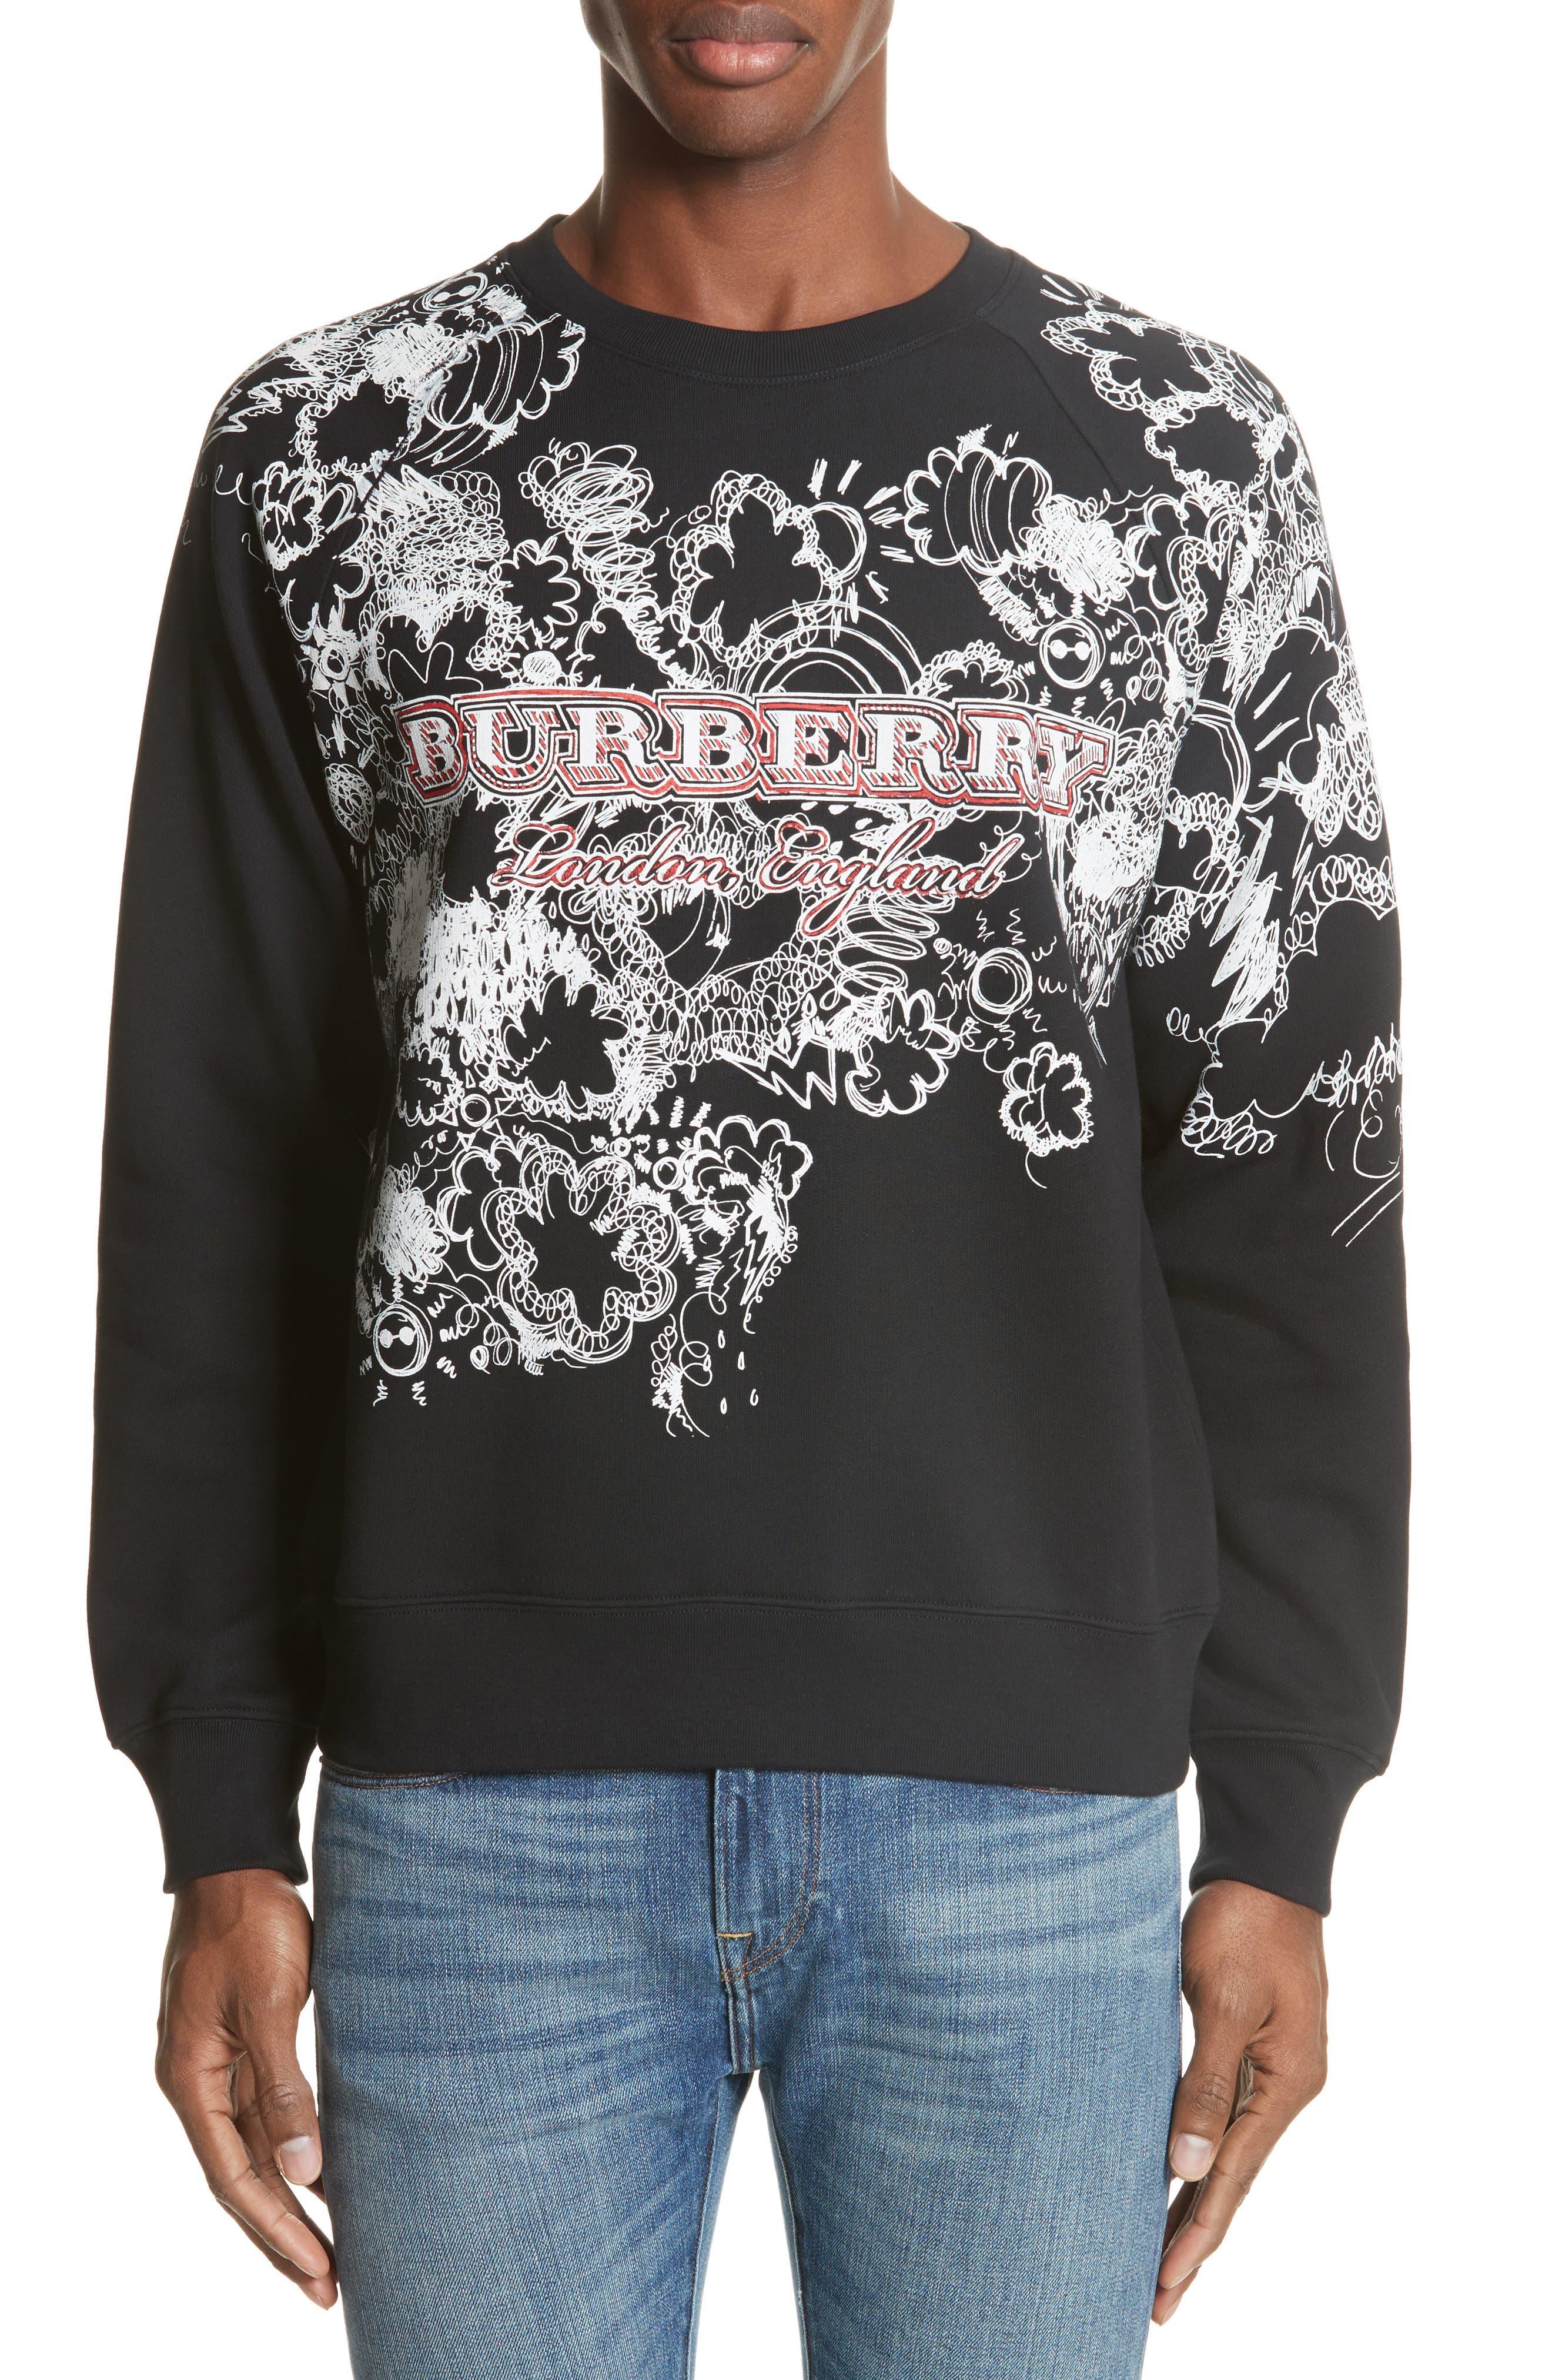 Barford Crewneck Sweatshirt,                         Main,                         color, Black